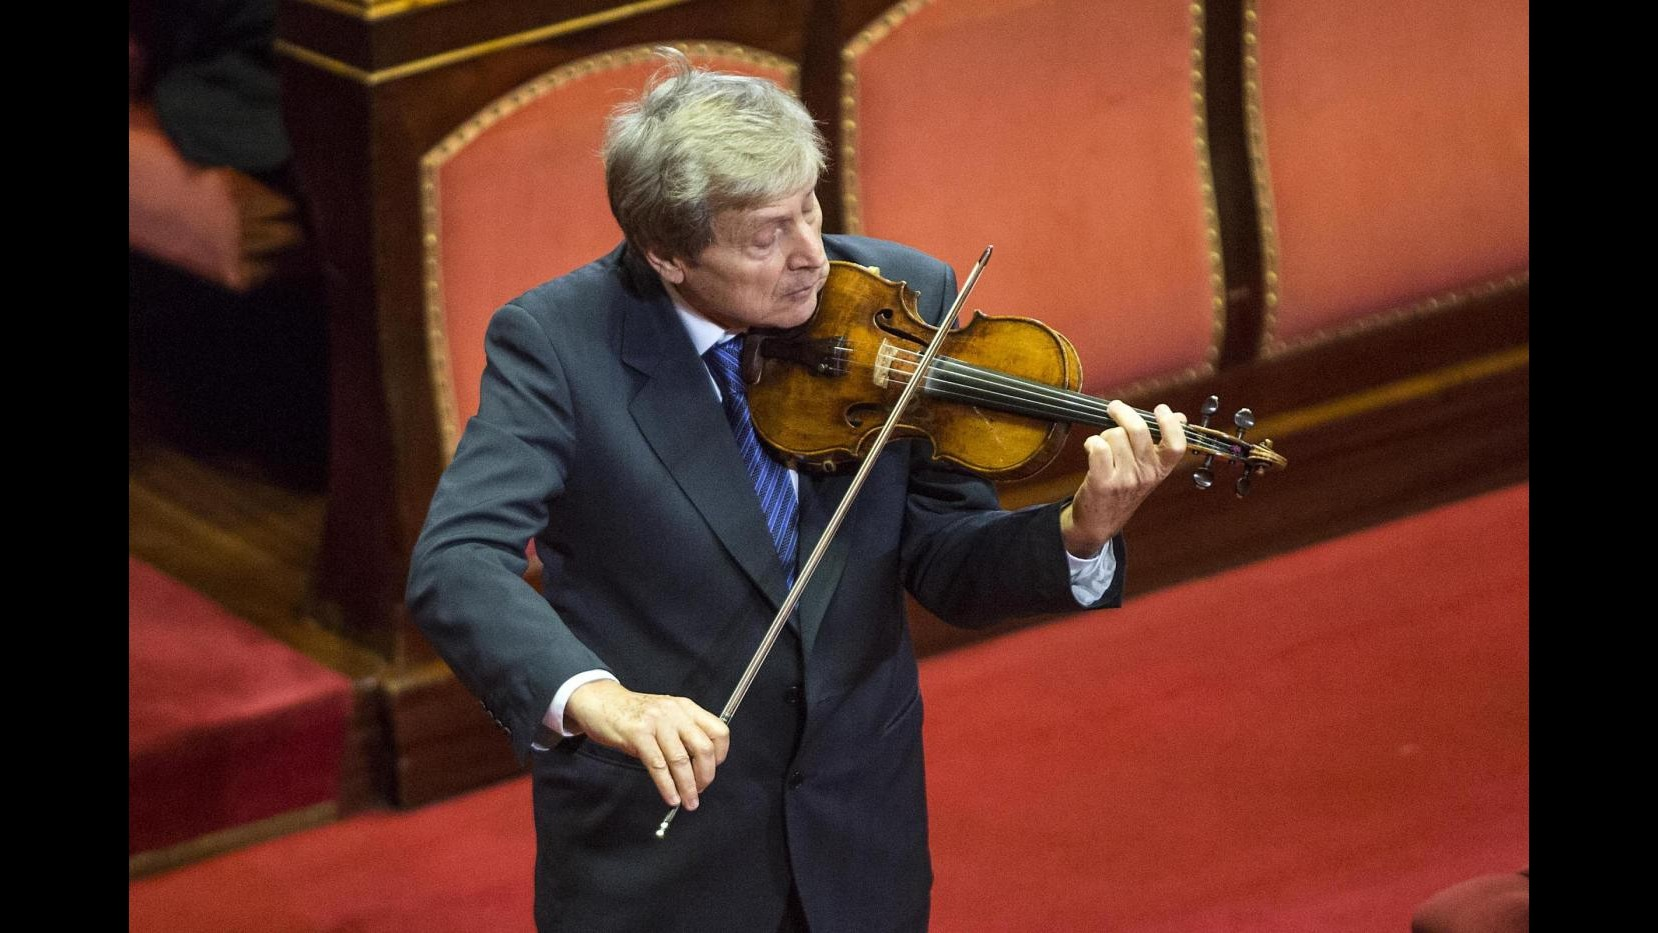 Uto Ughi renderà omaggio a Claudio Abbado con un concerto a Caracas